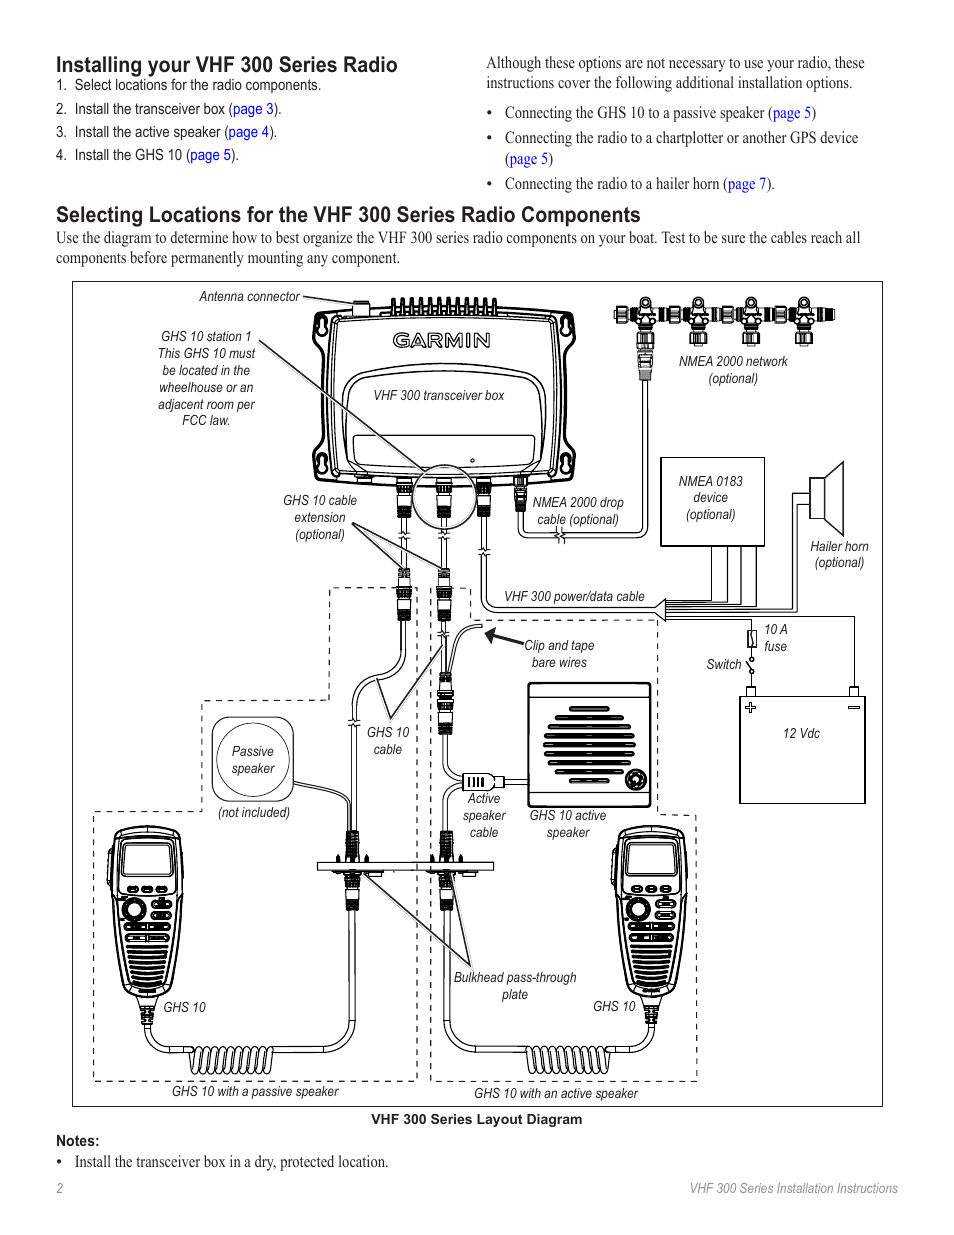 100 ideas garmin vhf 300 wire diagram on worksheetc download garmin vhf 300 wire diagram